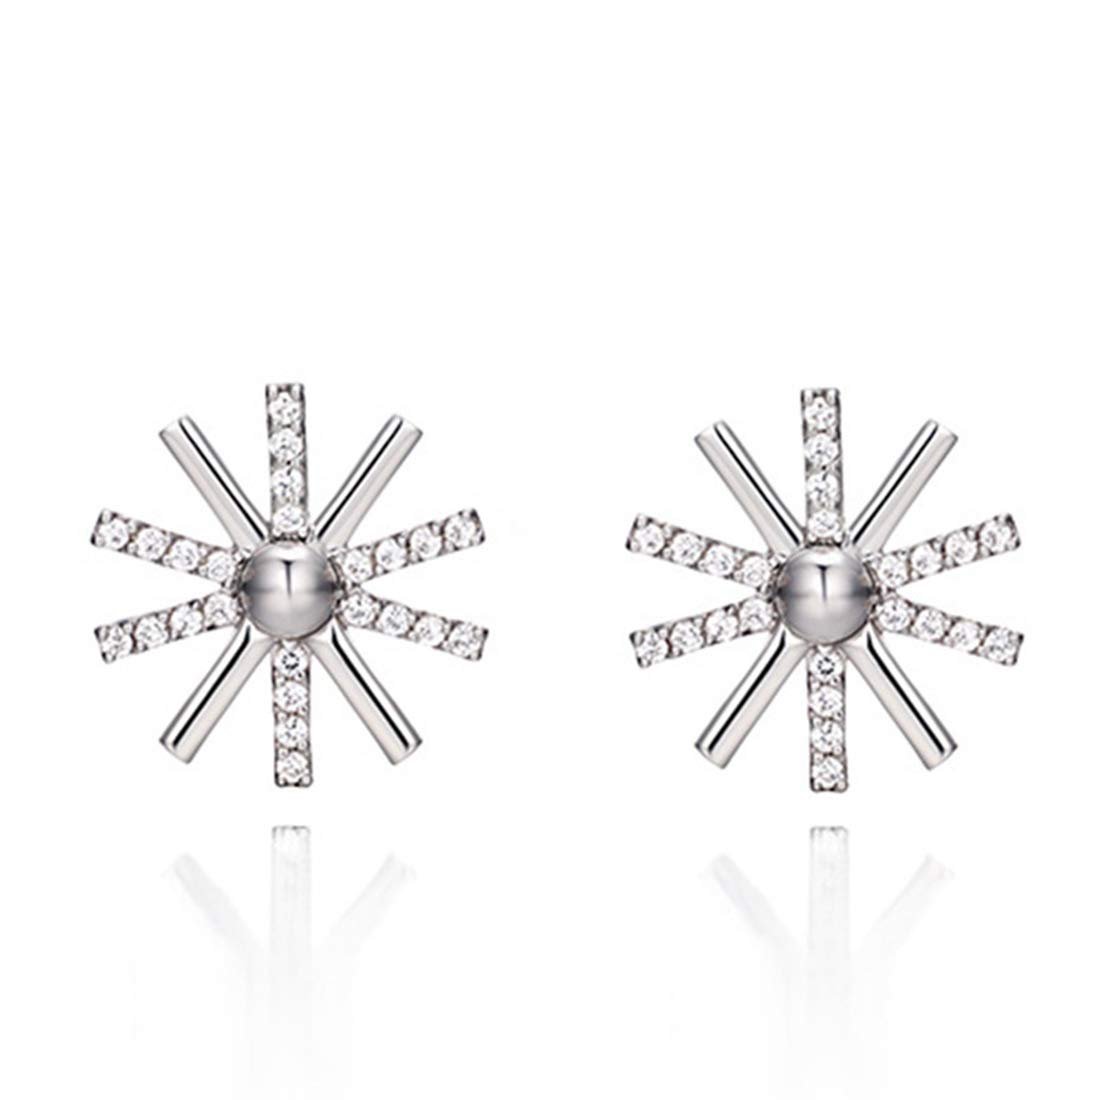 Stud Earrings for Girls BaiYunPOY Hypoallergenic Silver Plated Flower Stud Earring For Women Gift